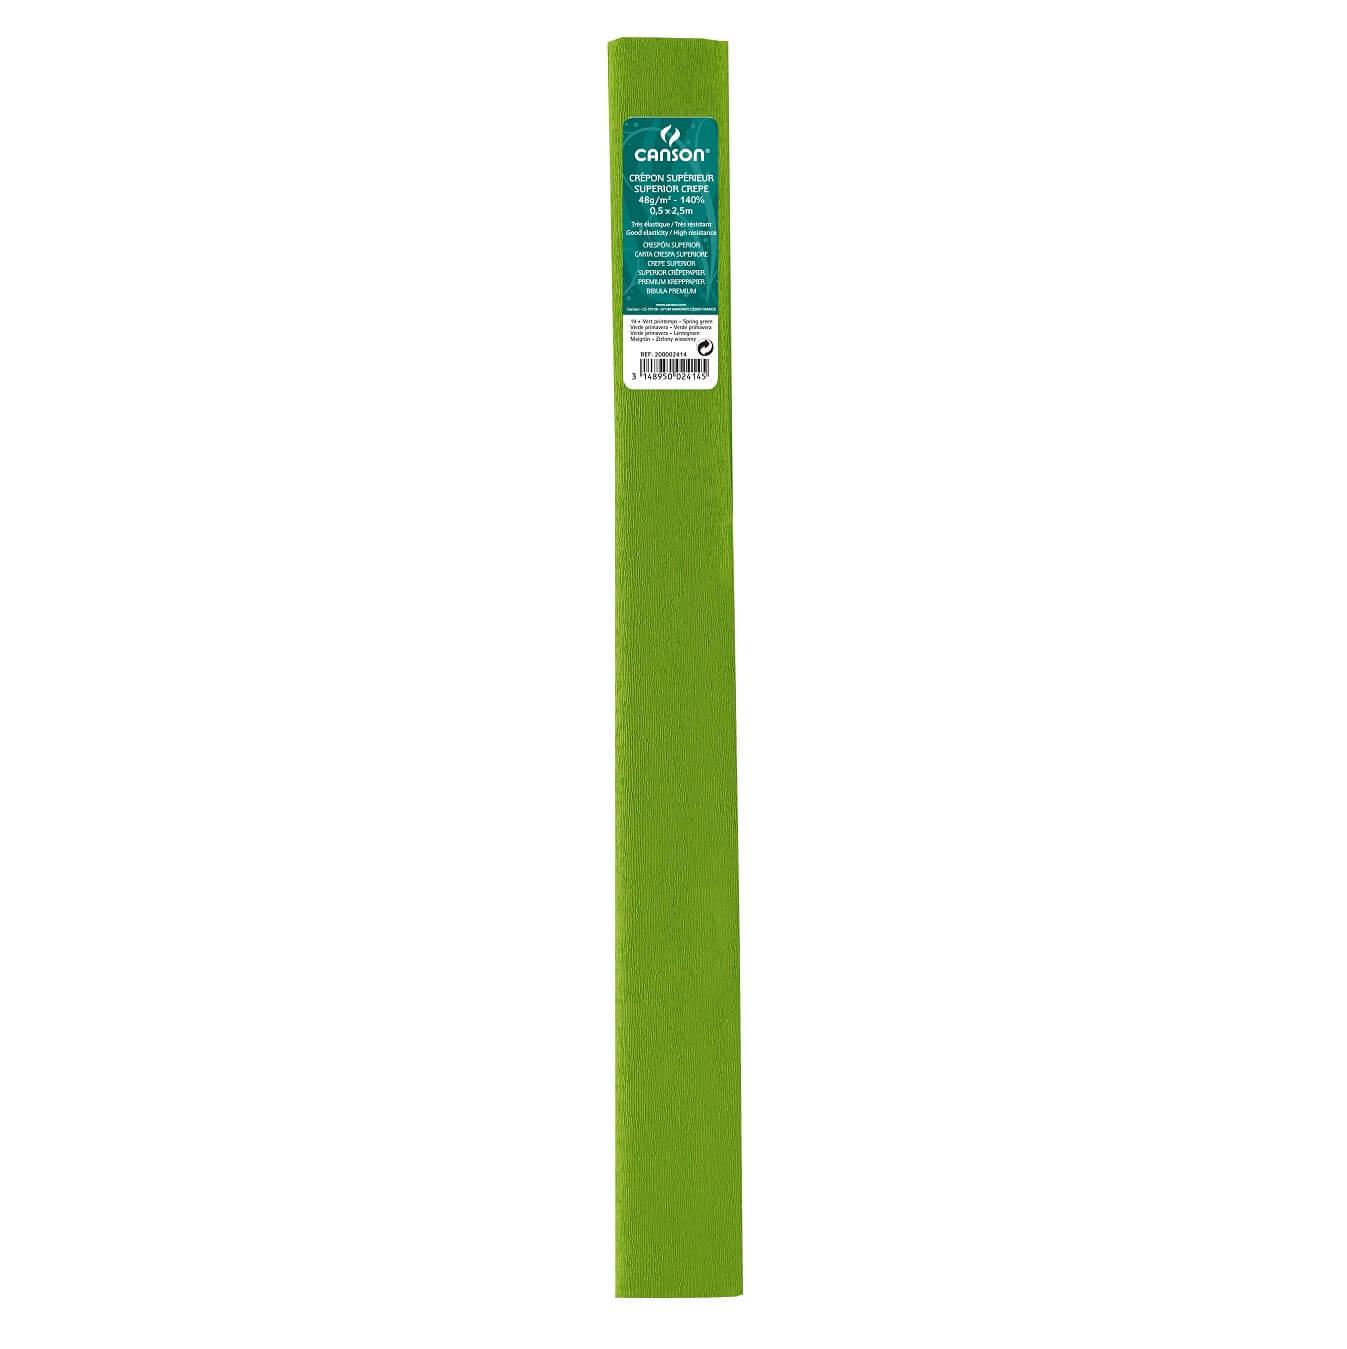 Papier crepon 48g vert printemps